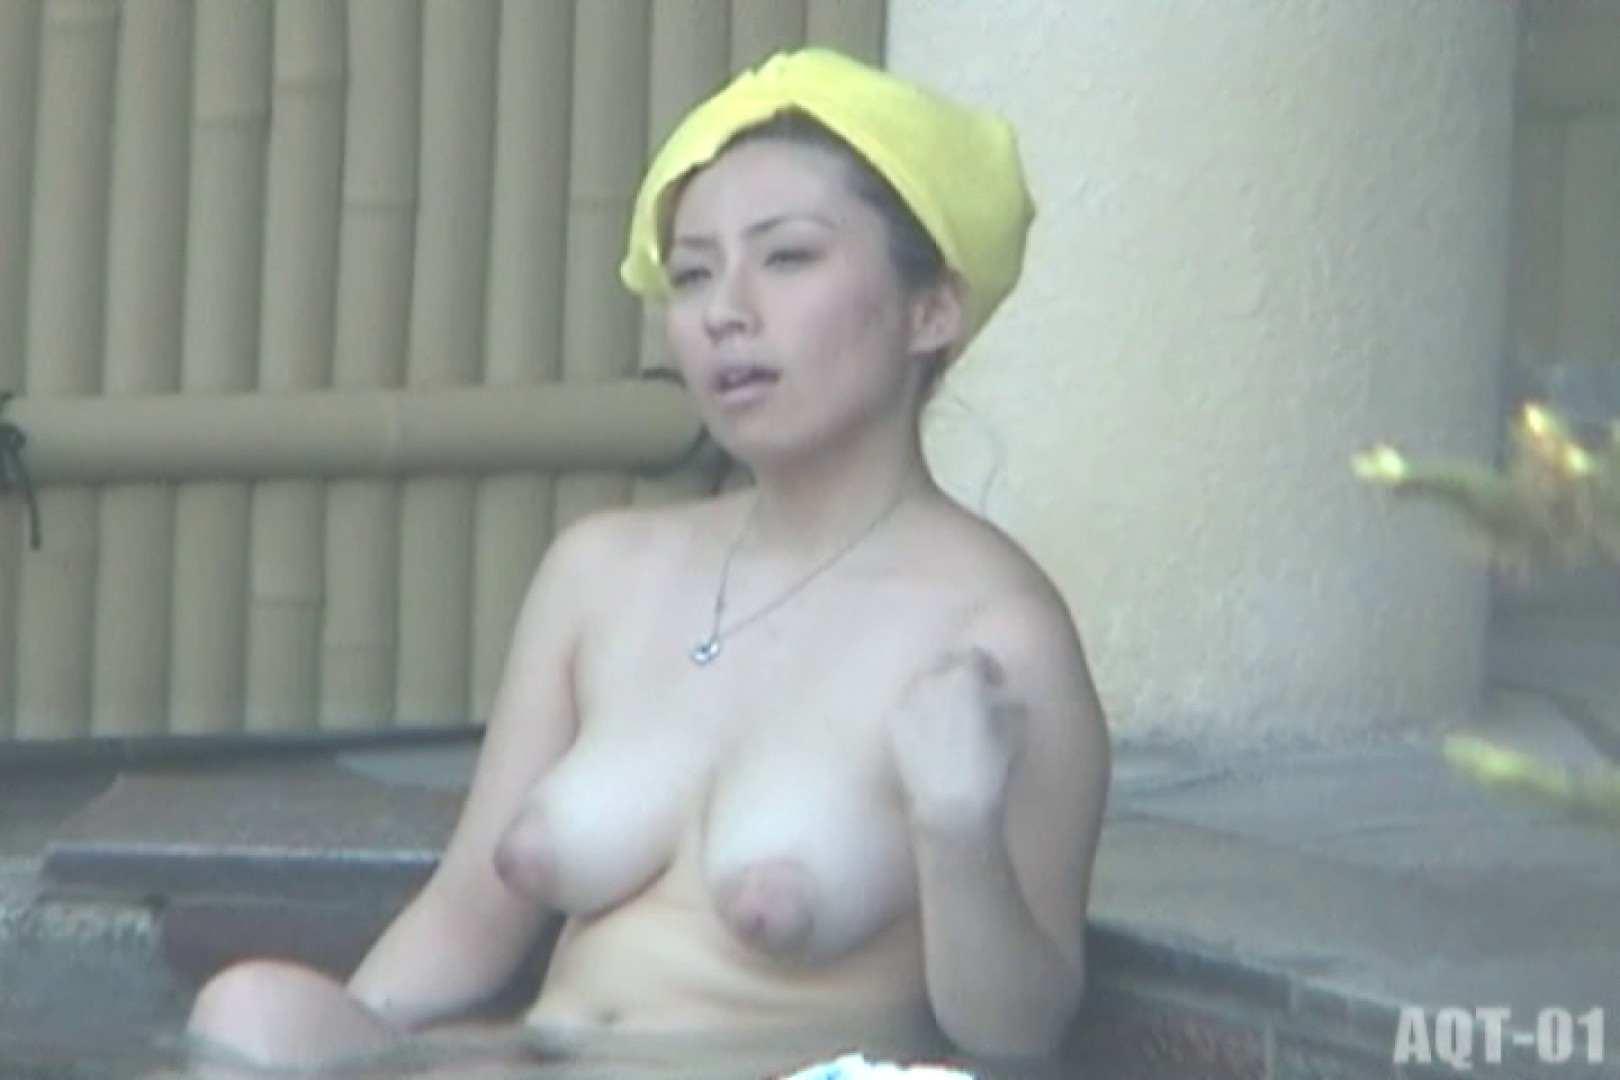 Aquaな露天風呂Vol.713 盗撮シリーズ | 露天風呂編  106PIX 93